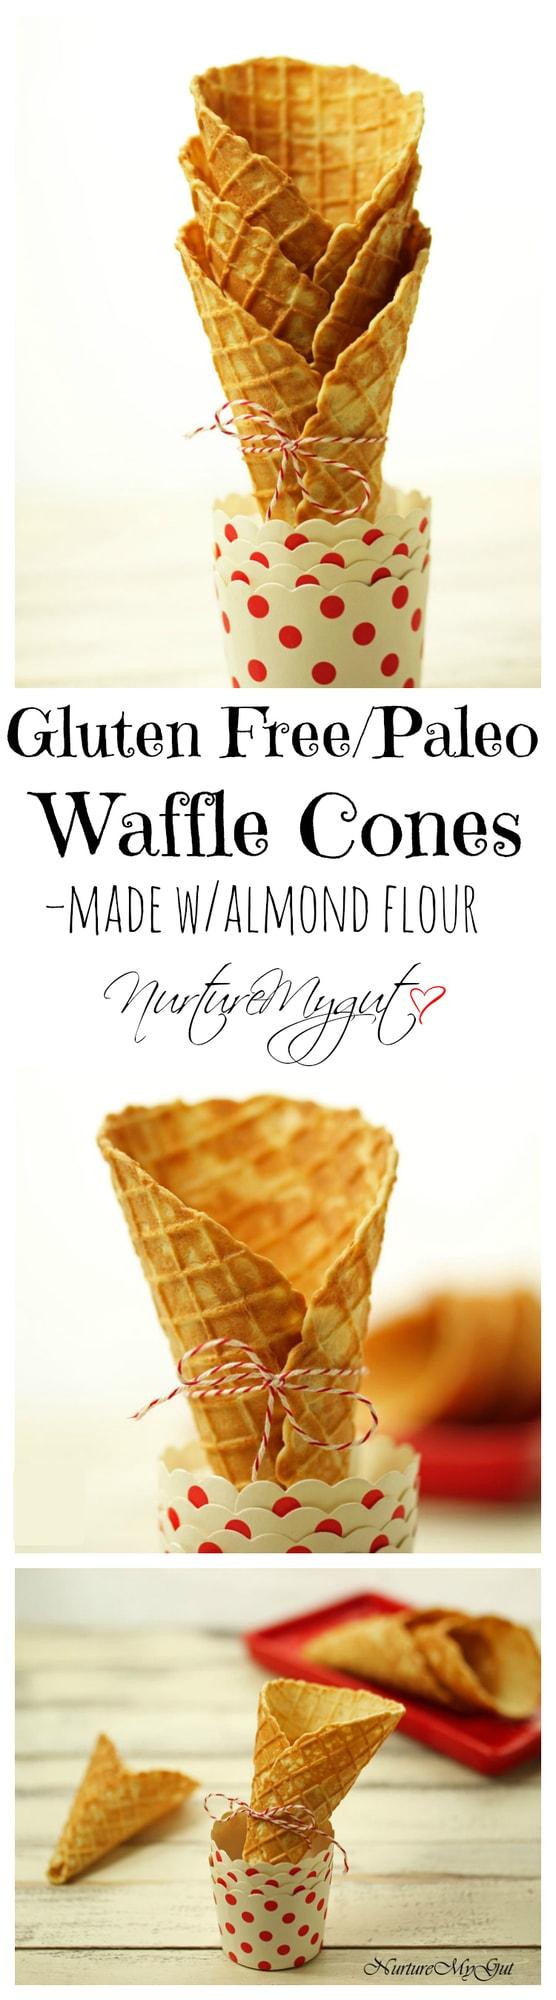 Gluten Free Paleo Waffle Cones